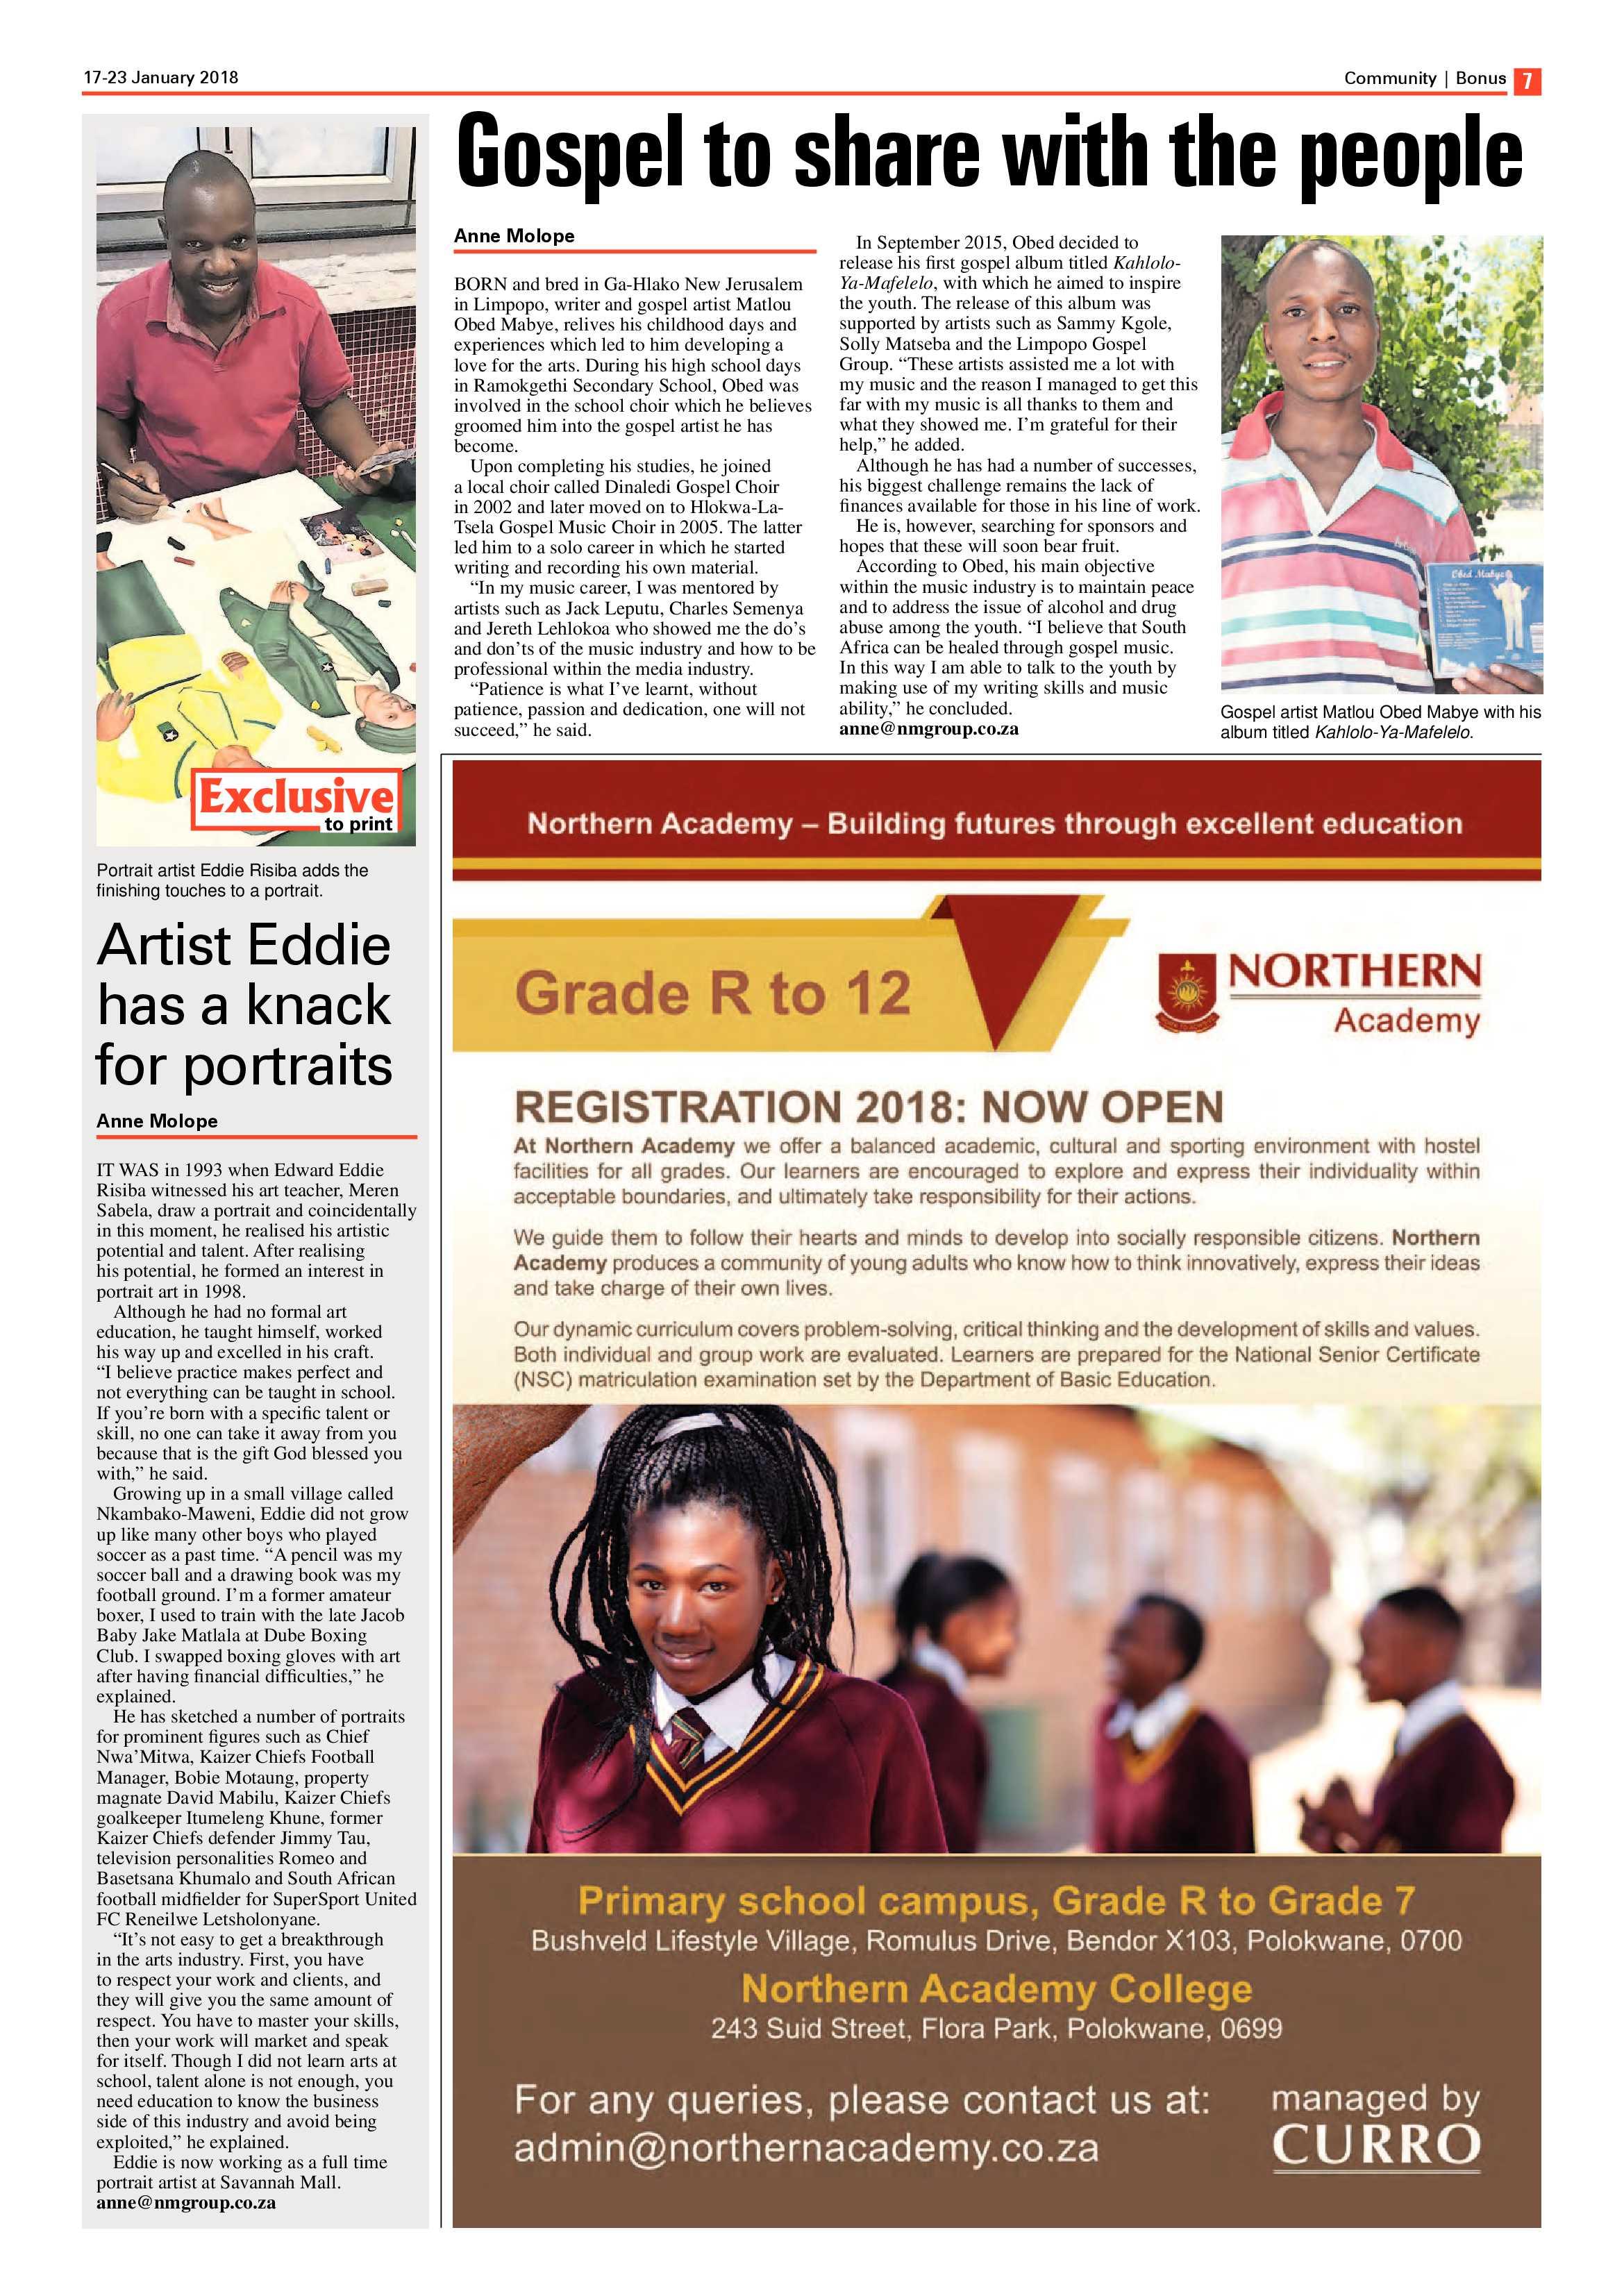 review-bonus-17-january-2018-epapers-page-7